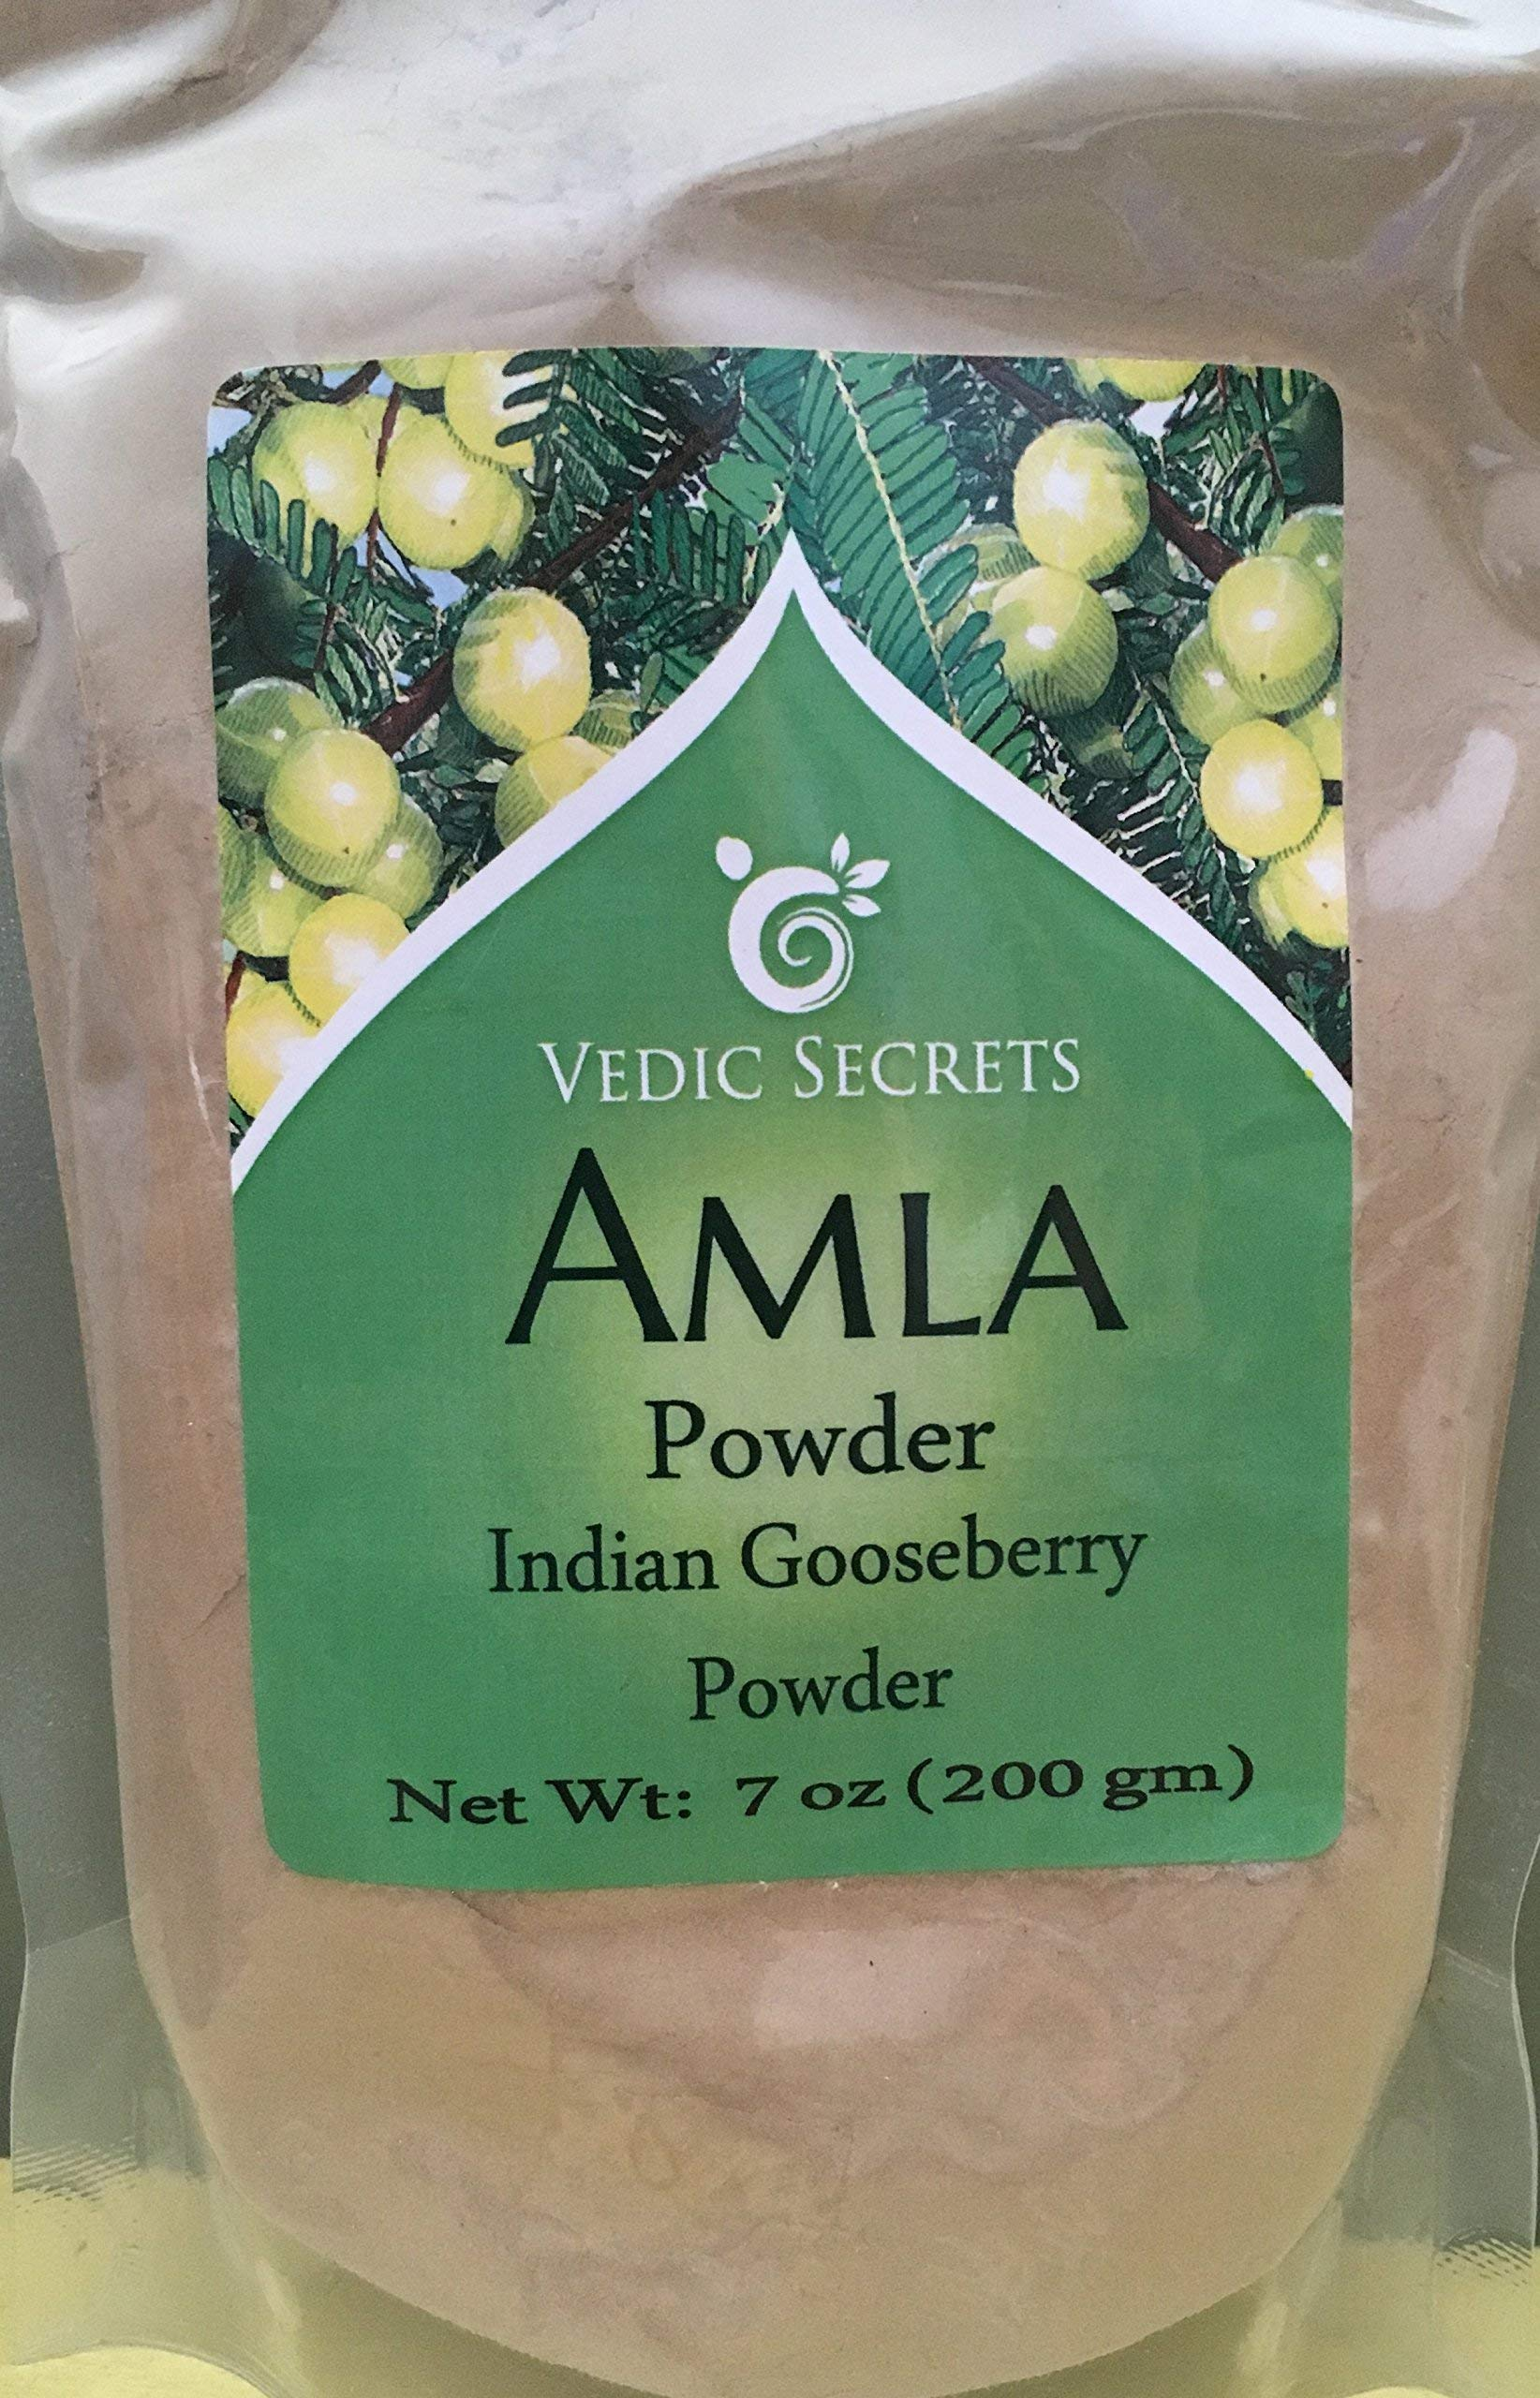 Vedic Secrets Amla (Indian Gooseberry) Powder - 200 Grams